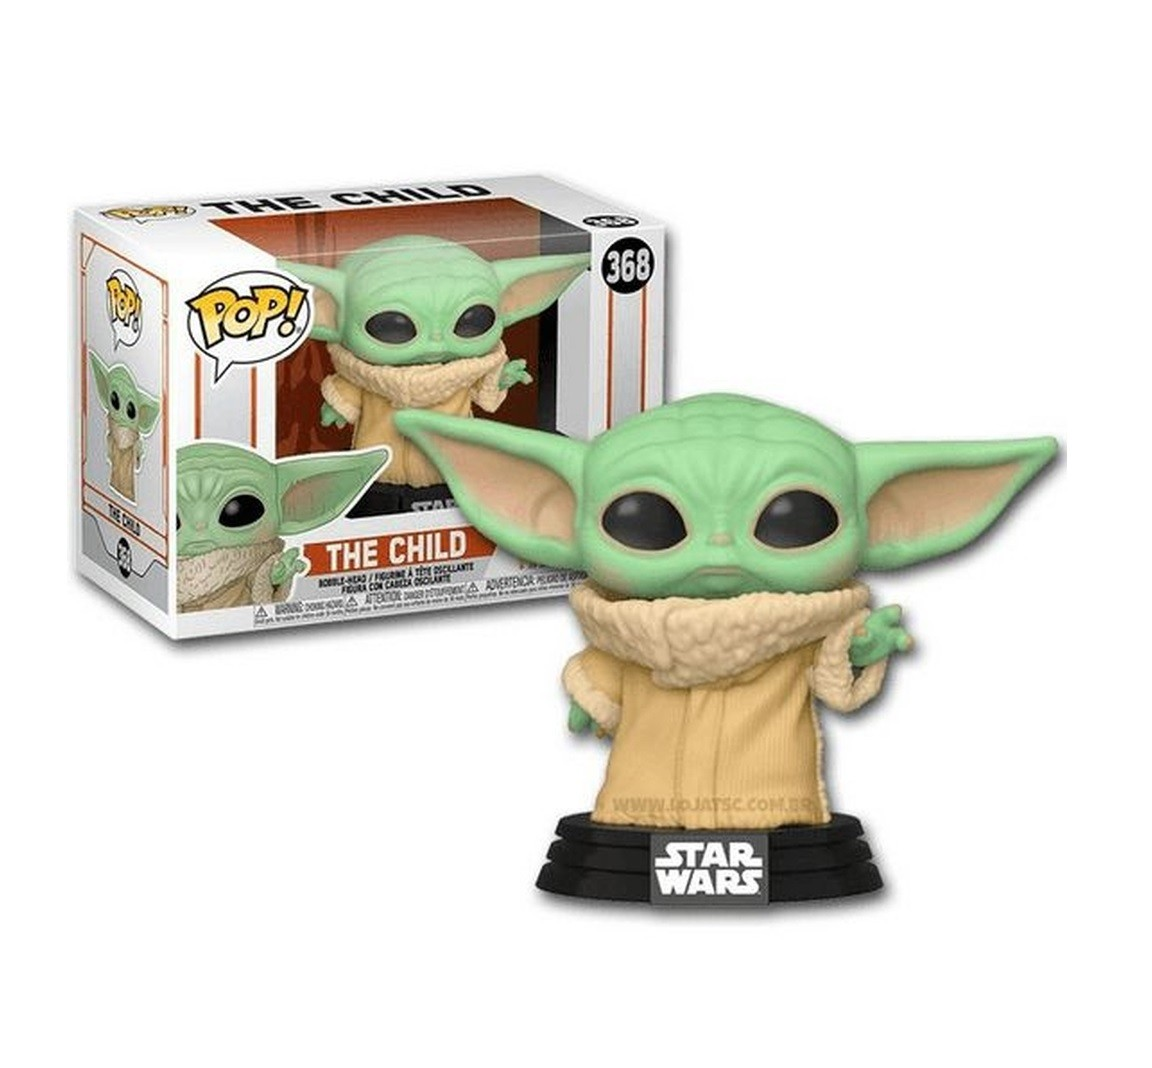 Funko Pop 368 The Child Mandal Orion Star Wars Baby Yoda